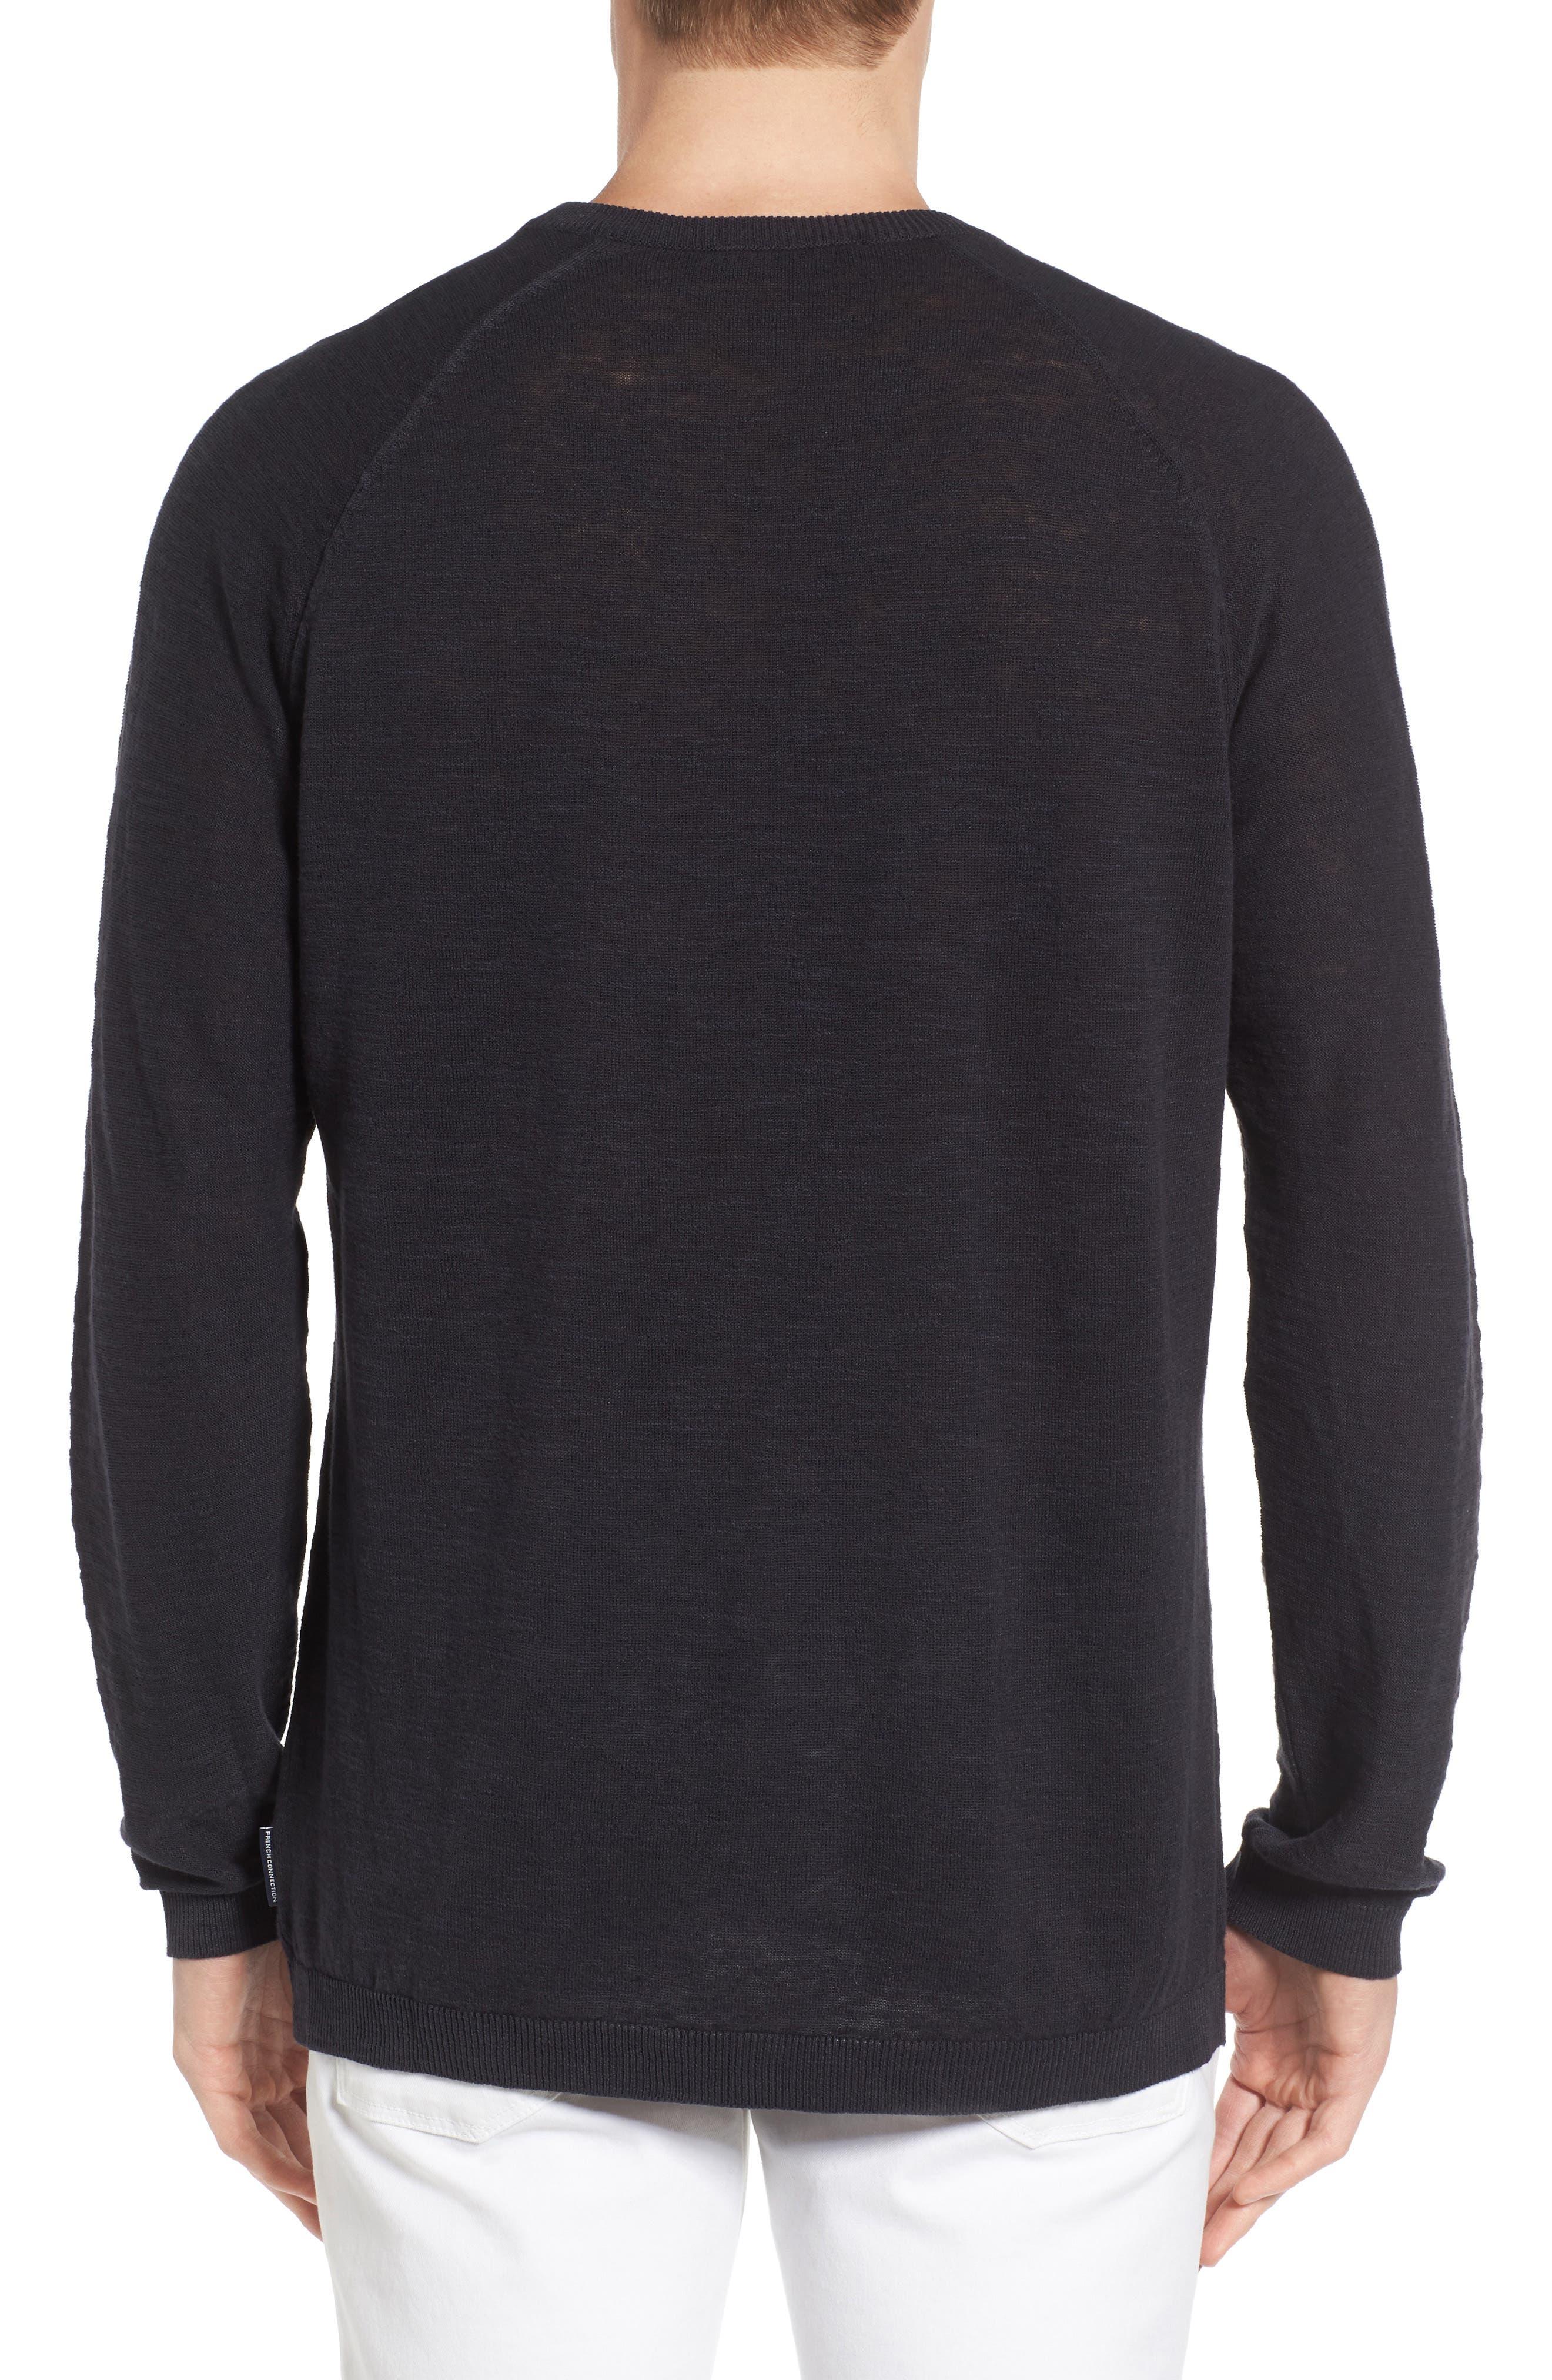 Arambol Cotton & Linen Sweater,                             Alternate thumbnail 2, color,                             409